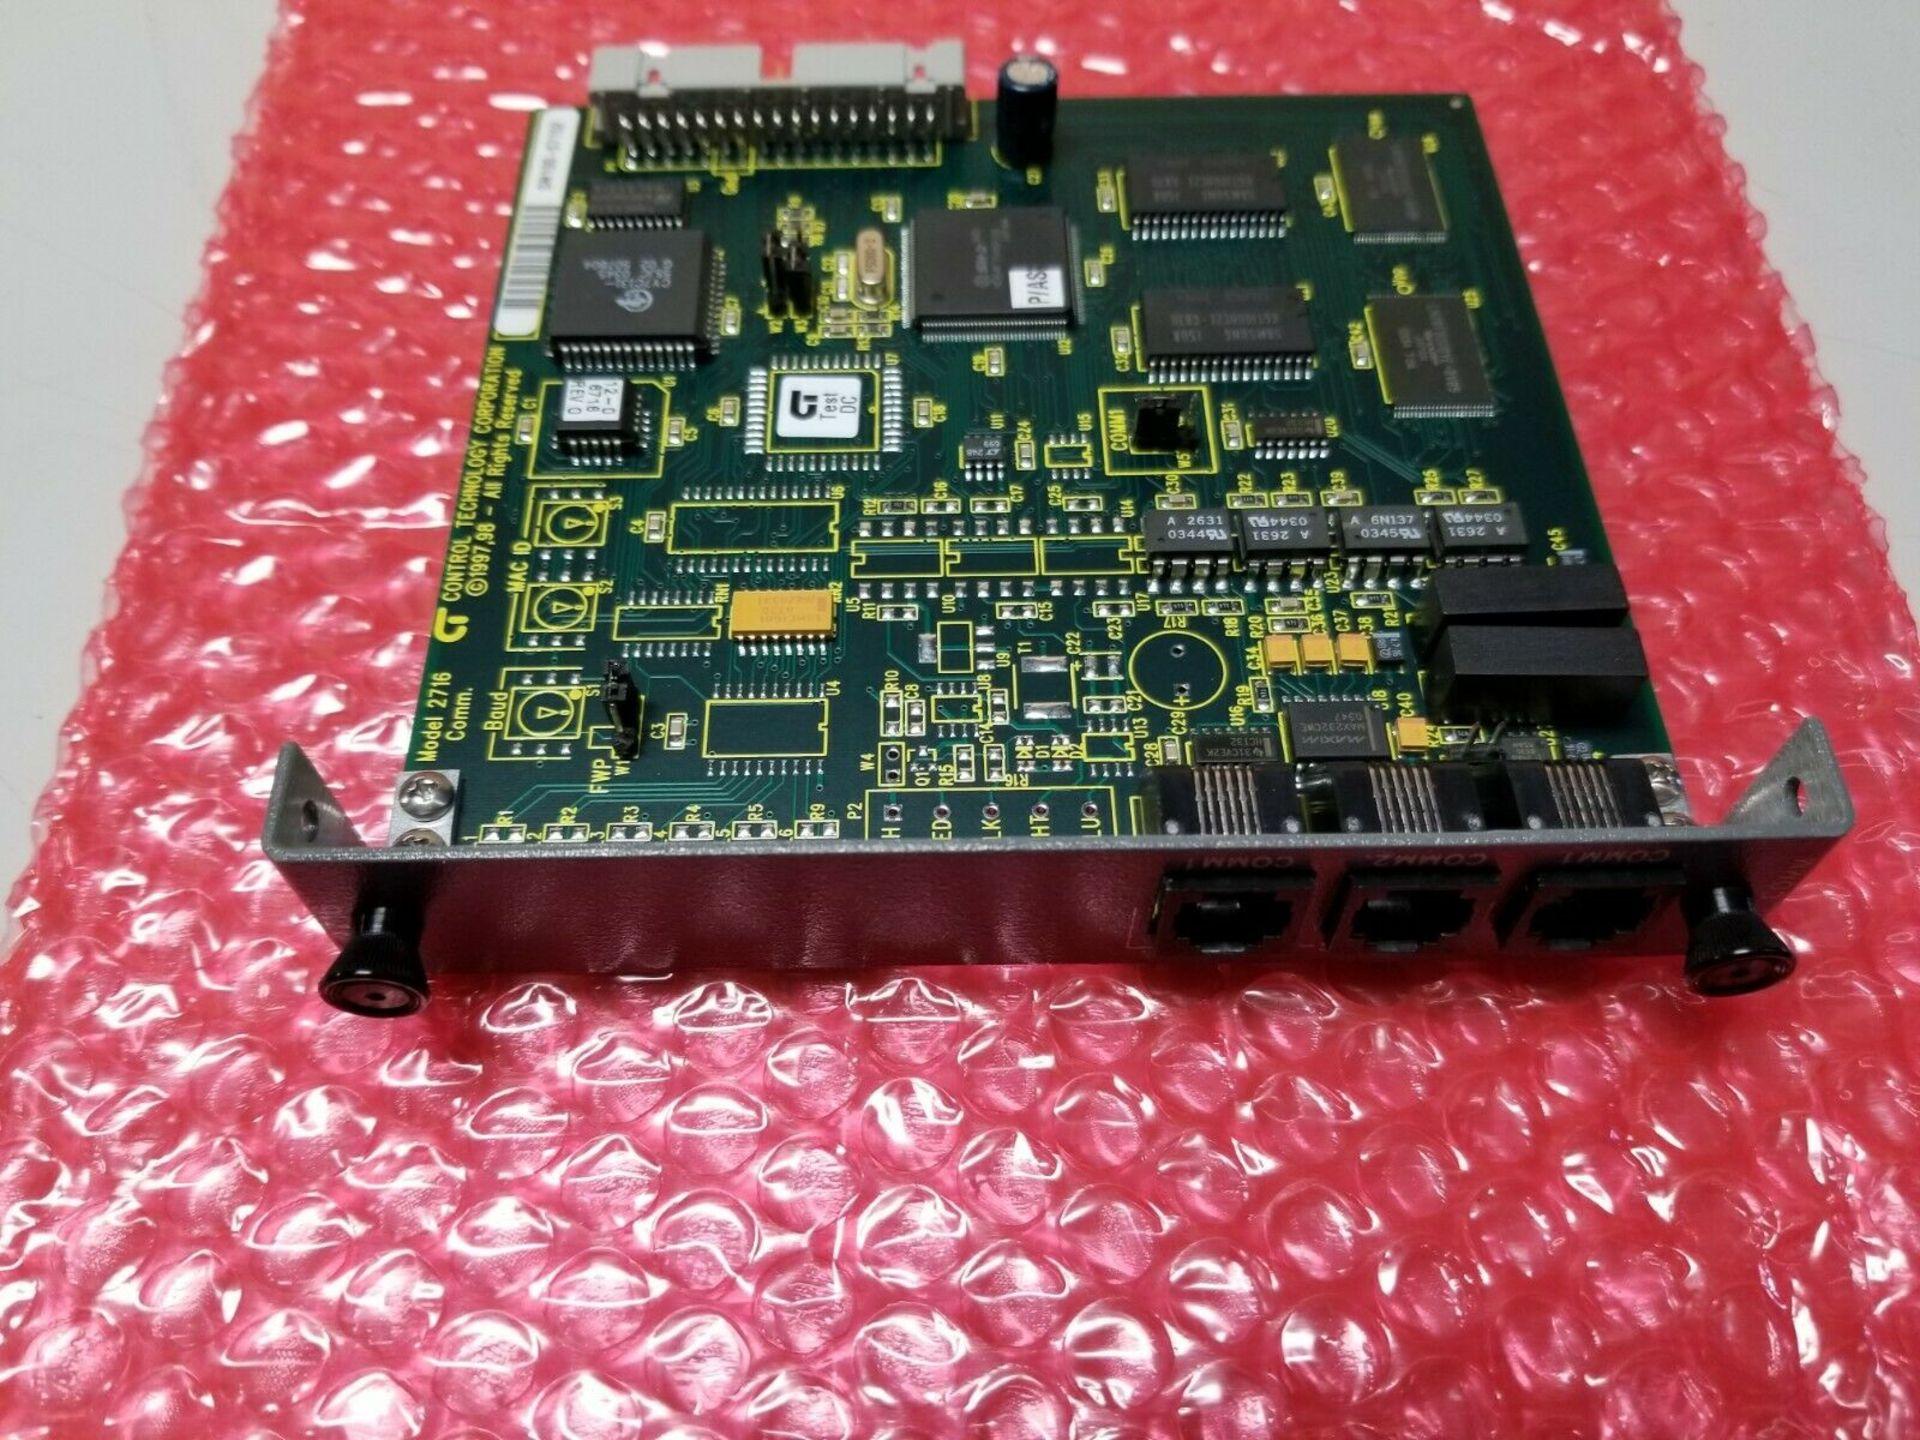 Lot 633 - CONTROL TECHNOLOGY PLC MODULE